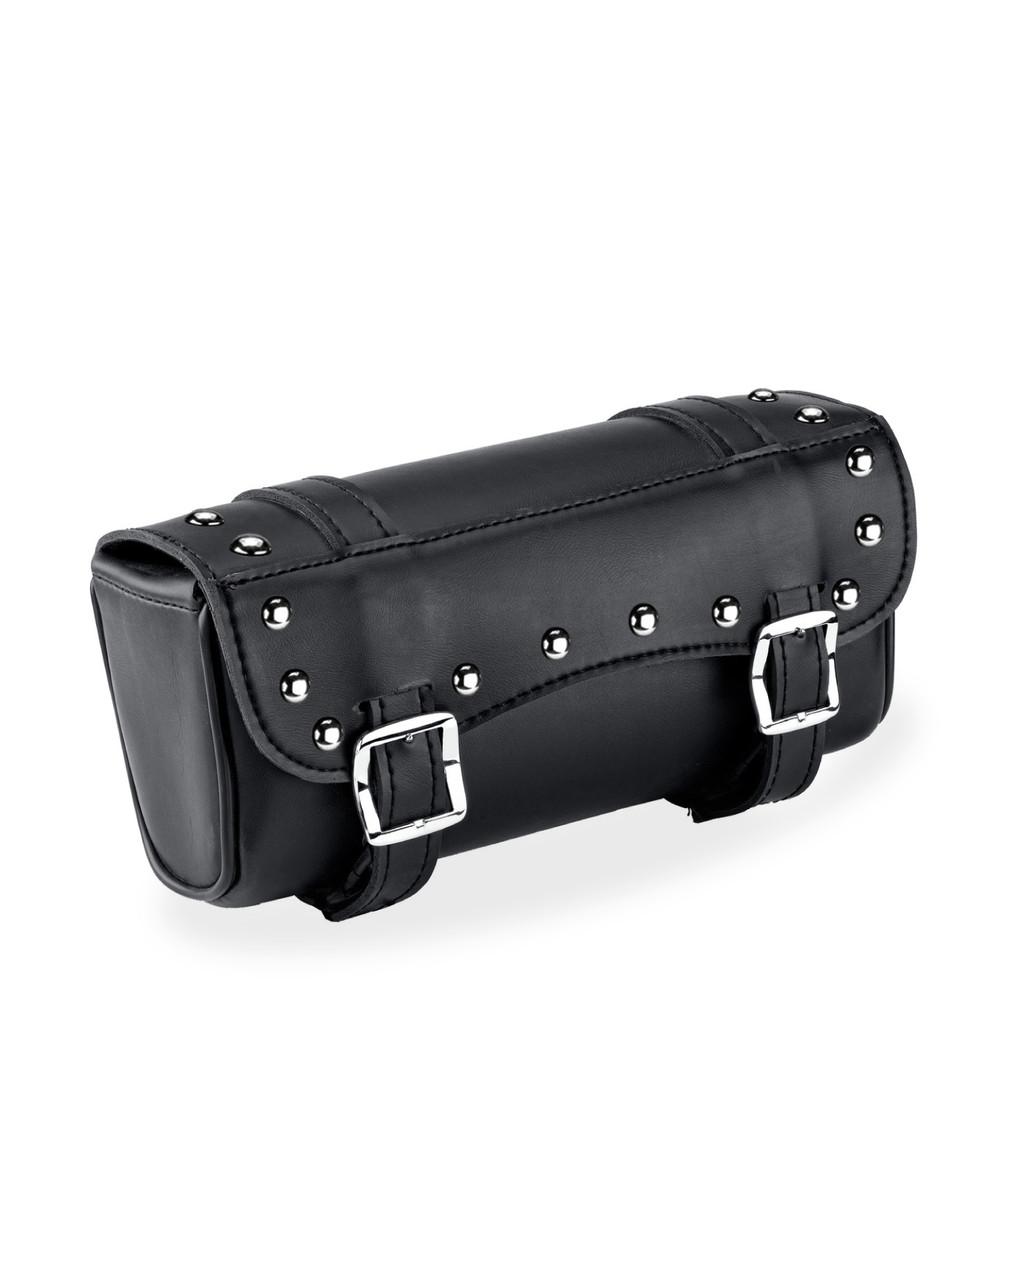 Honda Medium Universal Studded Motorcycle Tool Bag Main Bag View